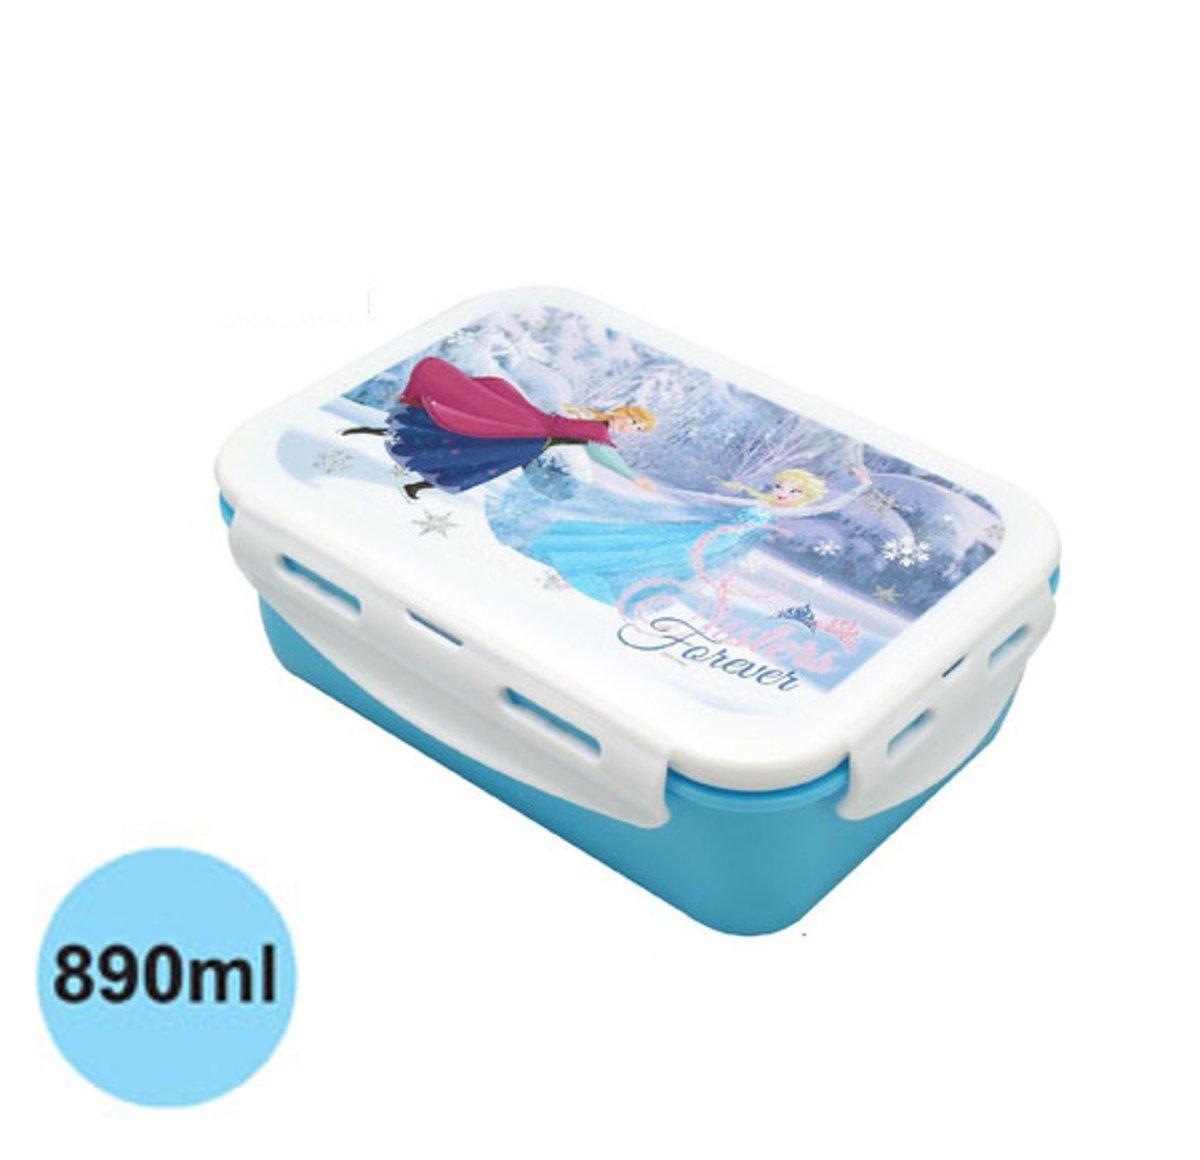 Frozen Lunch Box(890ml)(Licensed by Disney)